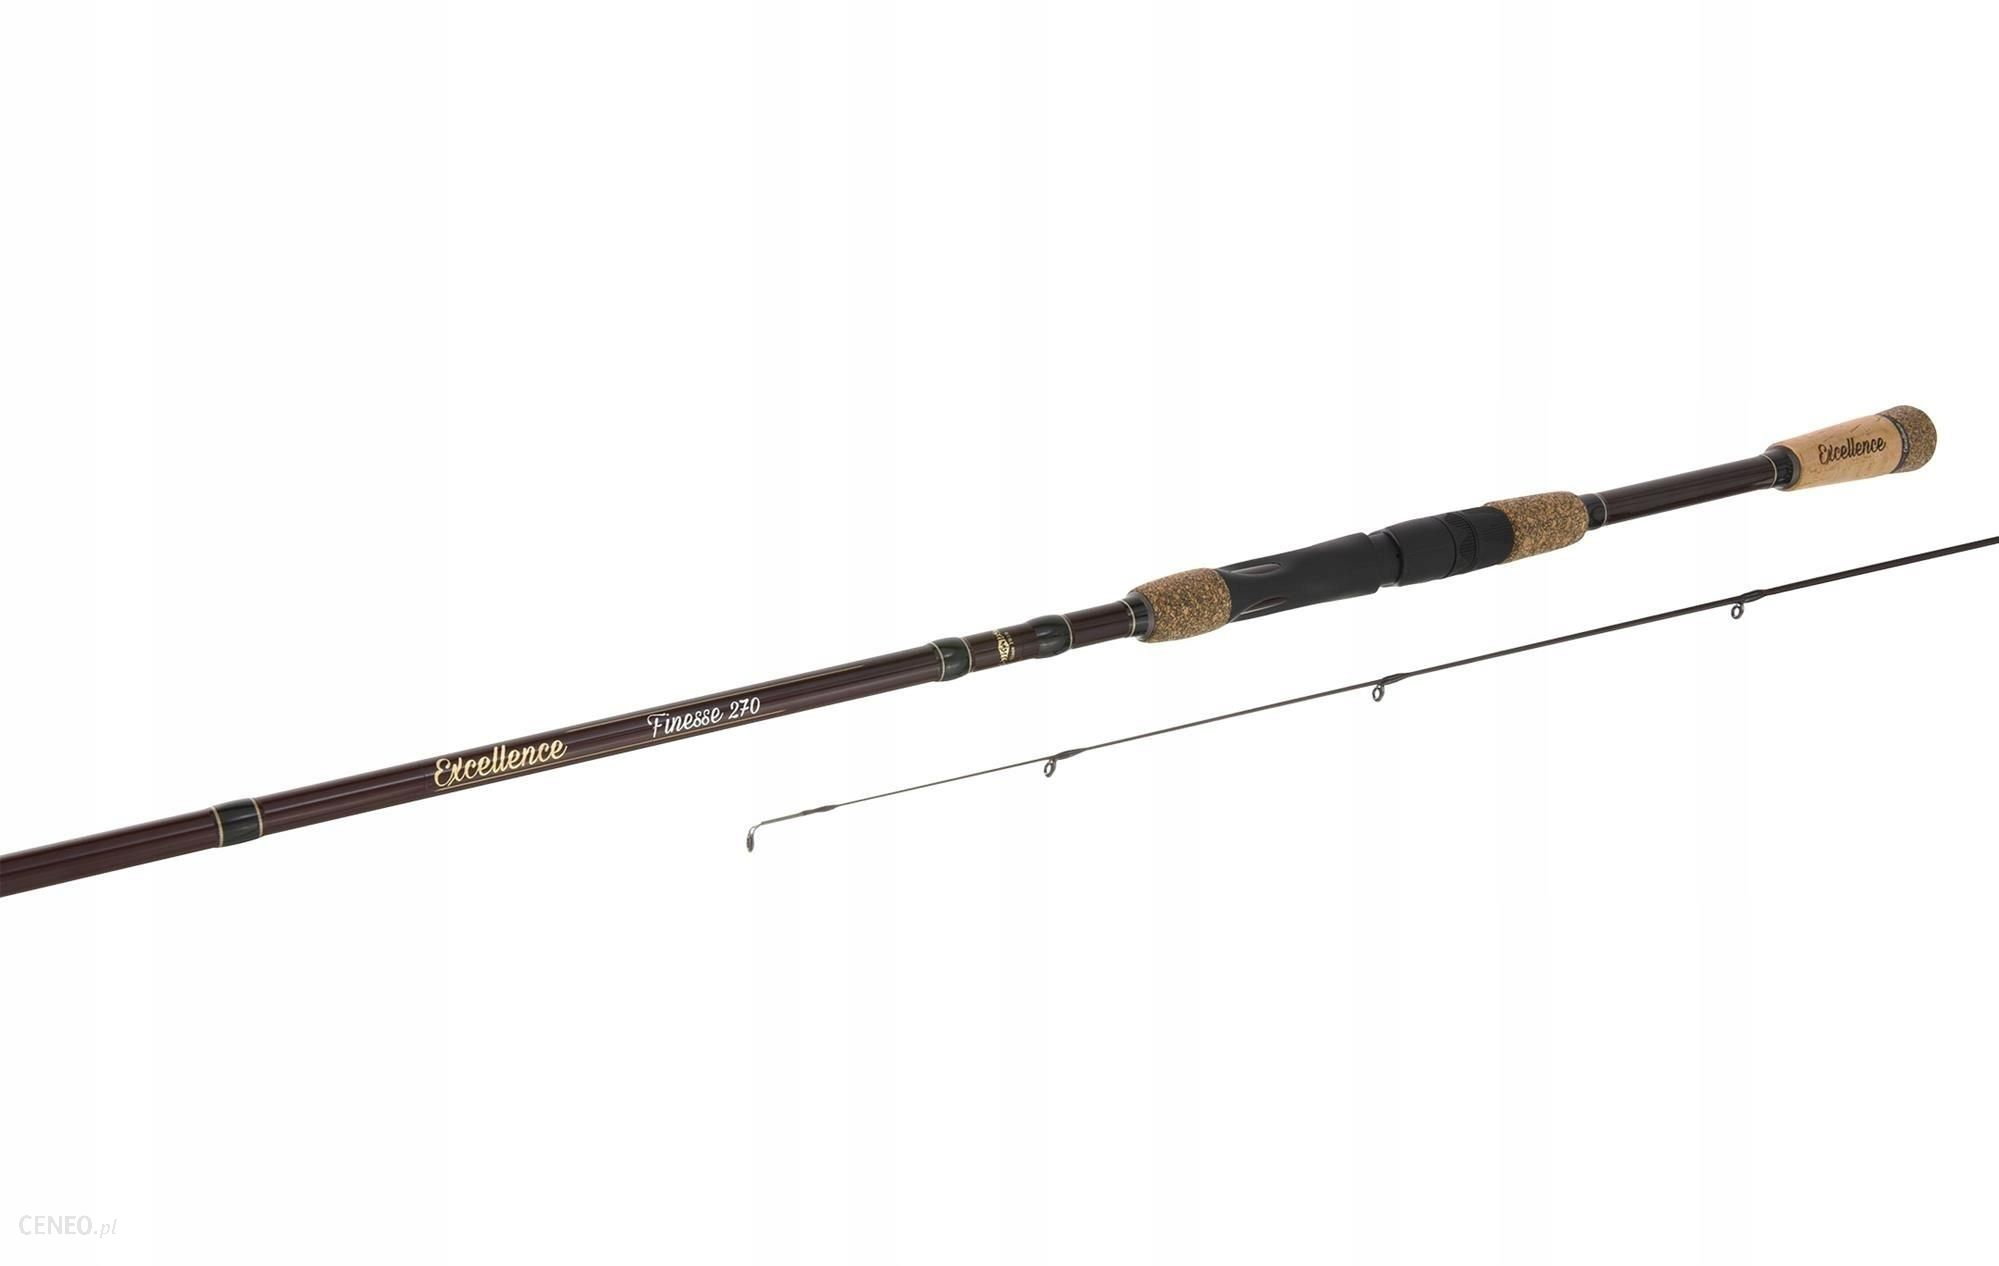 Wędka Mikado Excellence Finesse 270cm 2-10g